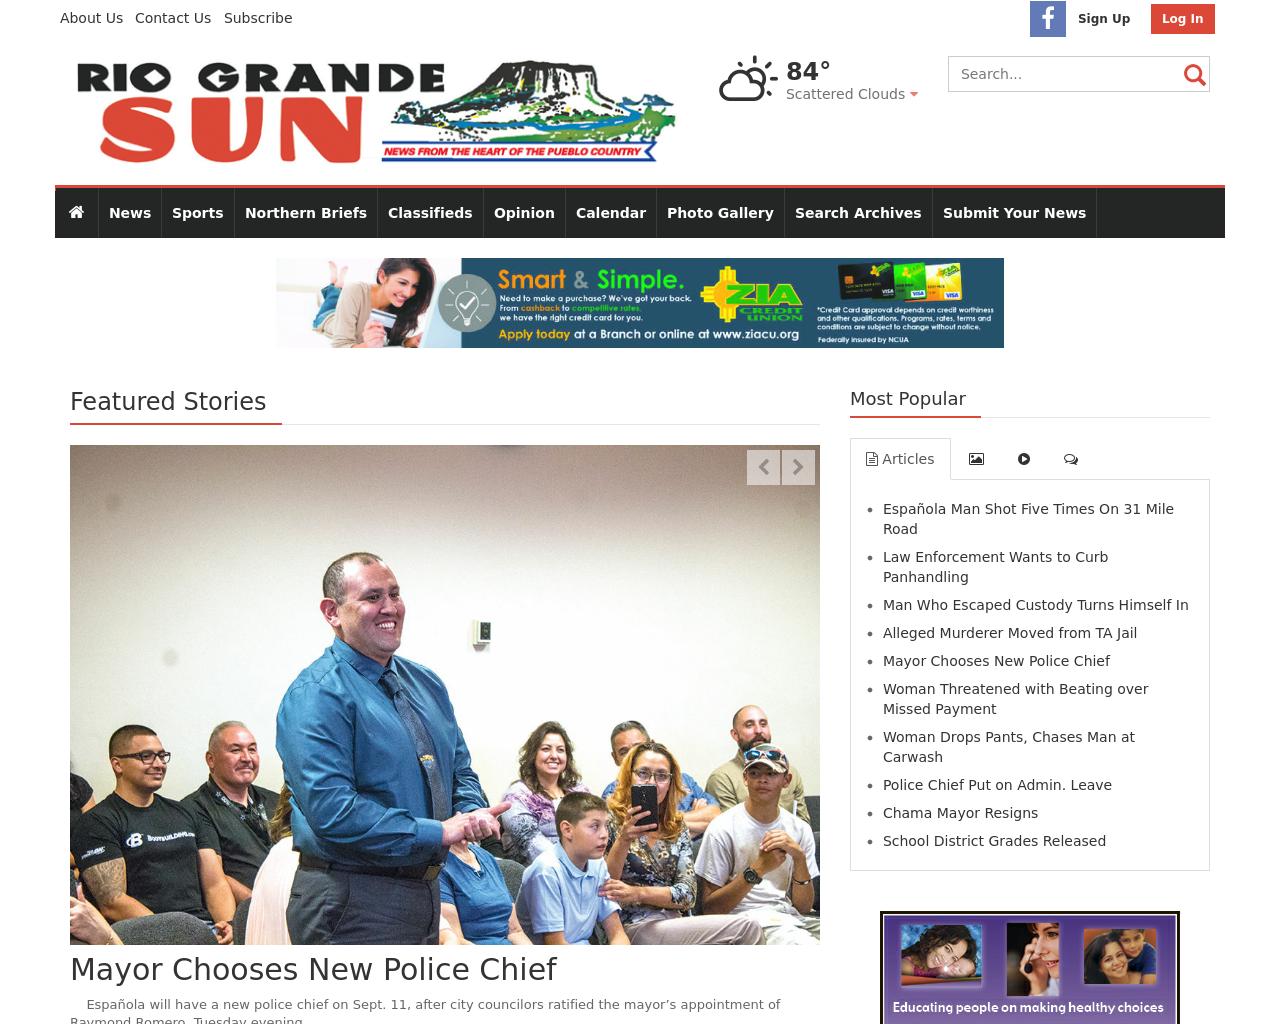 Rio-Grande-Sun-Advertising-Reviews-Pricing